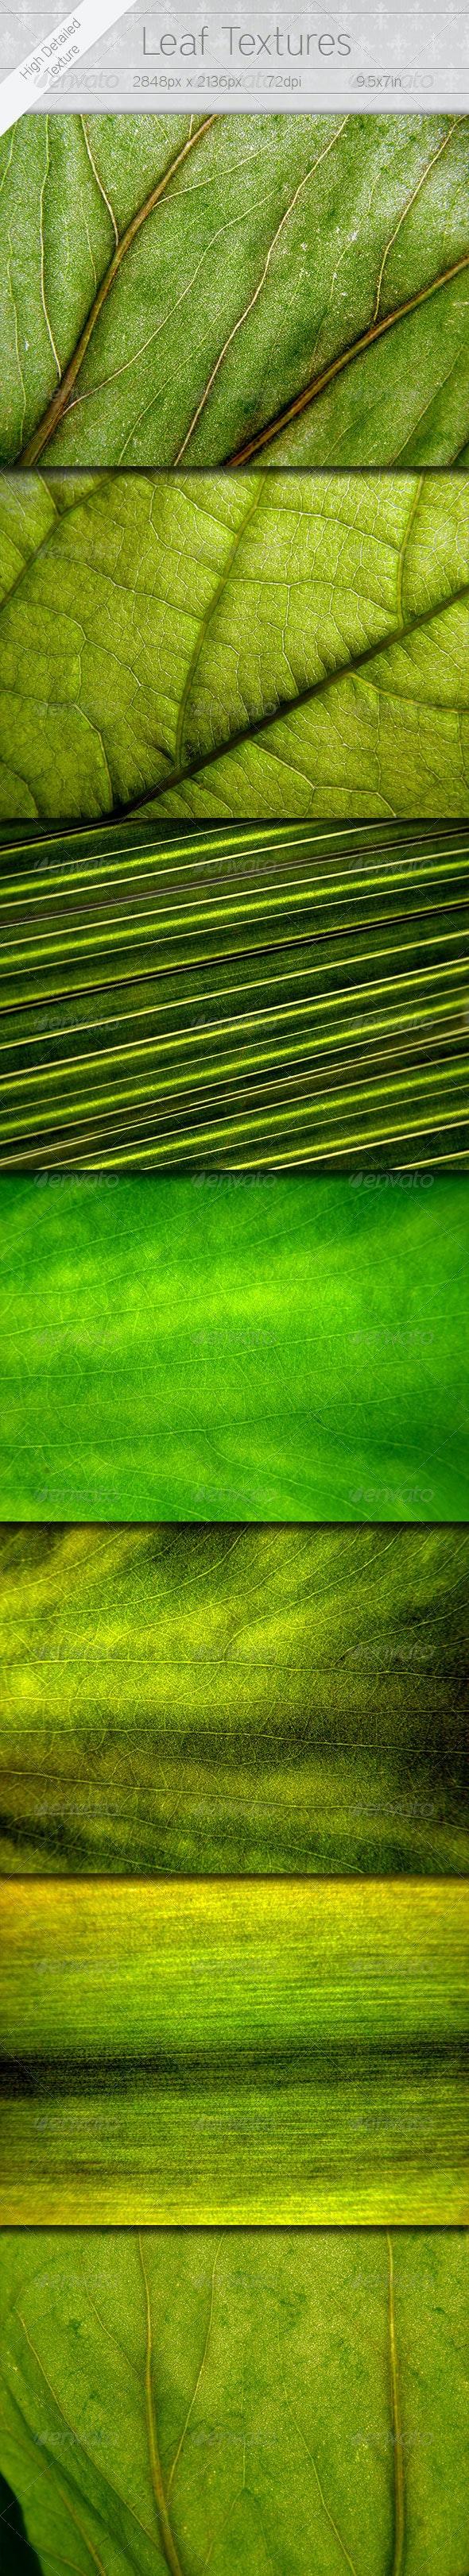 7 Leaf Textures - Nature Textures